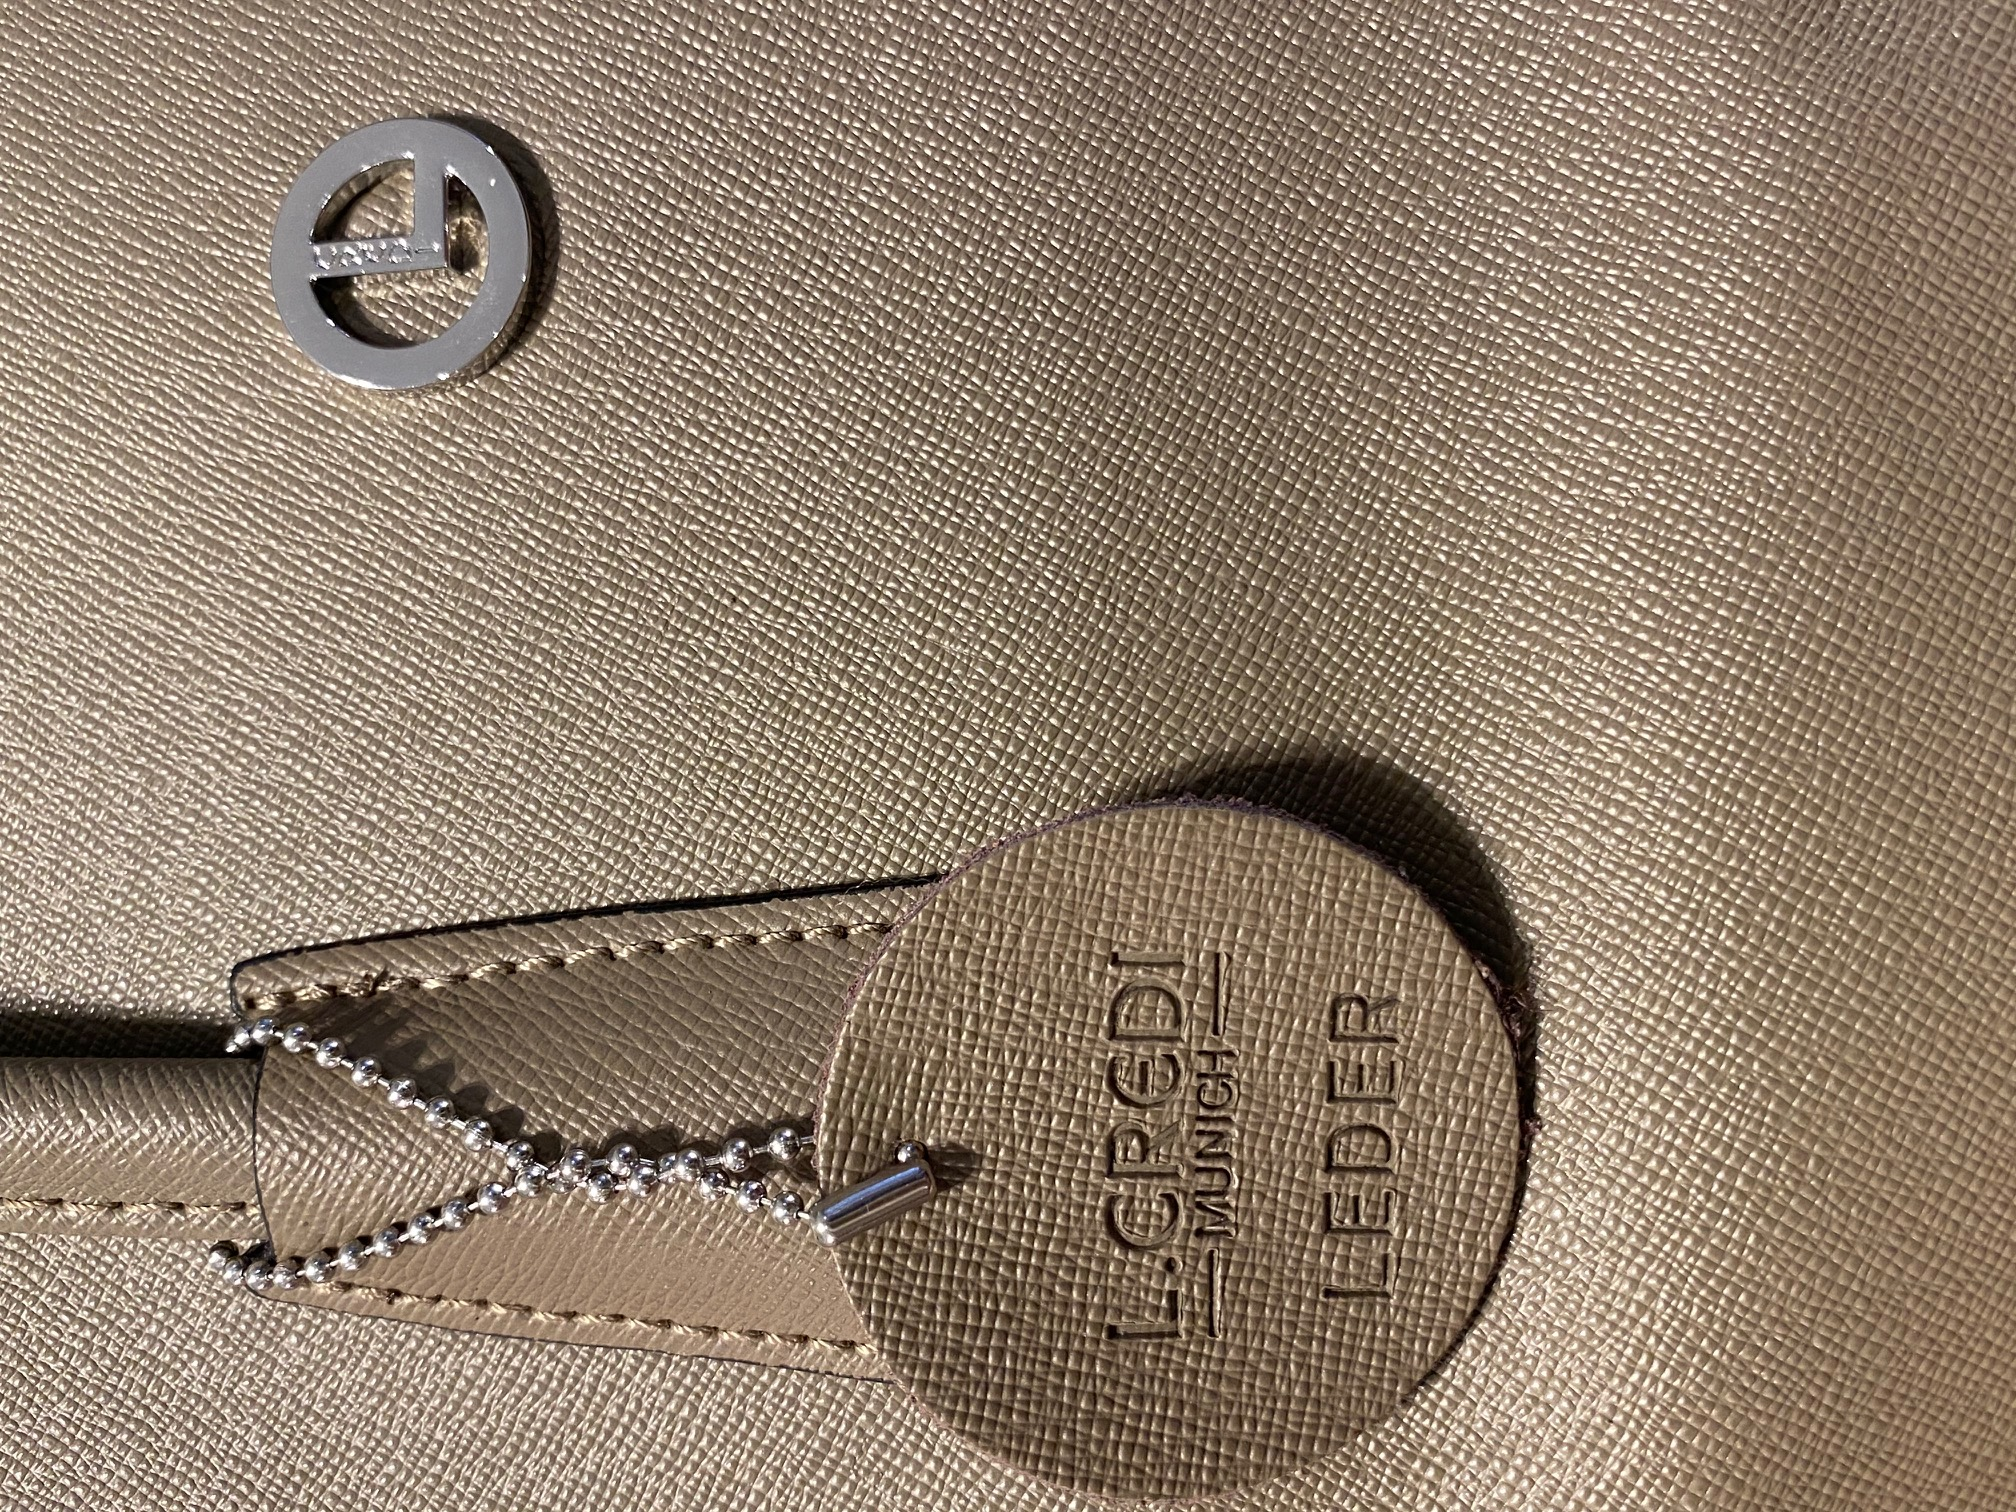 Tasche Leder grau grün L Credi 1